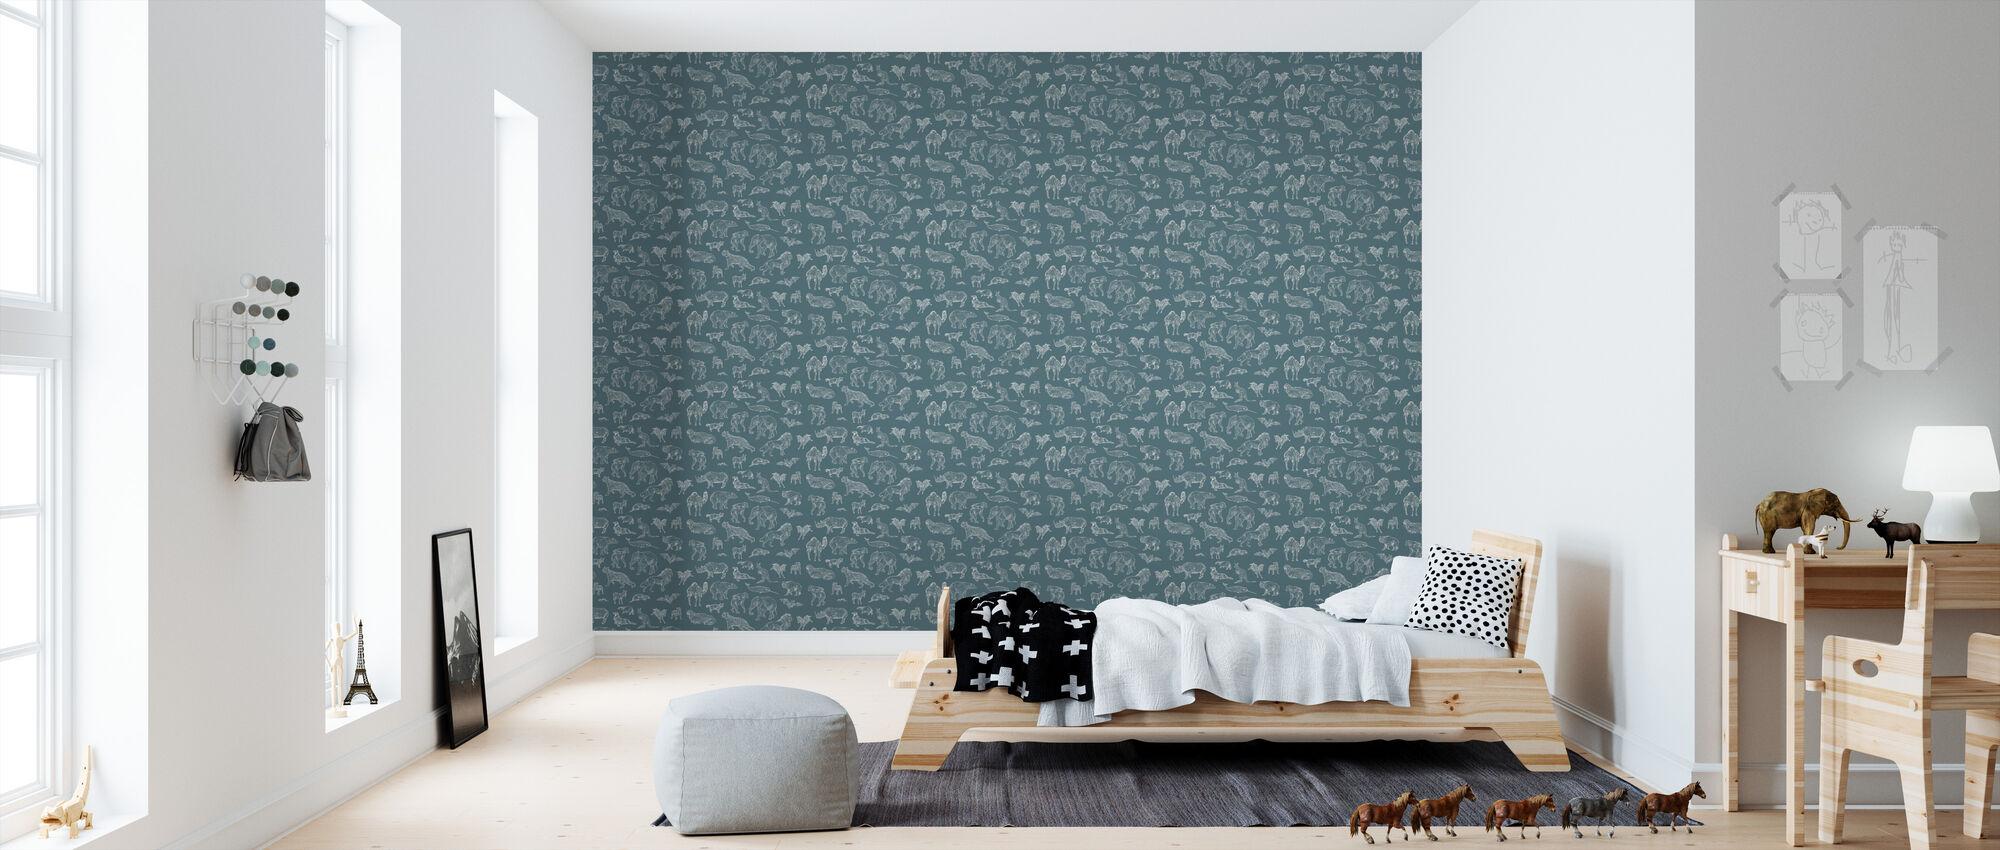 Lots of Animals Night - Wallpaper - Kids Room